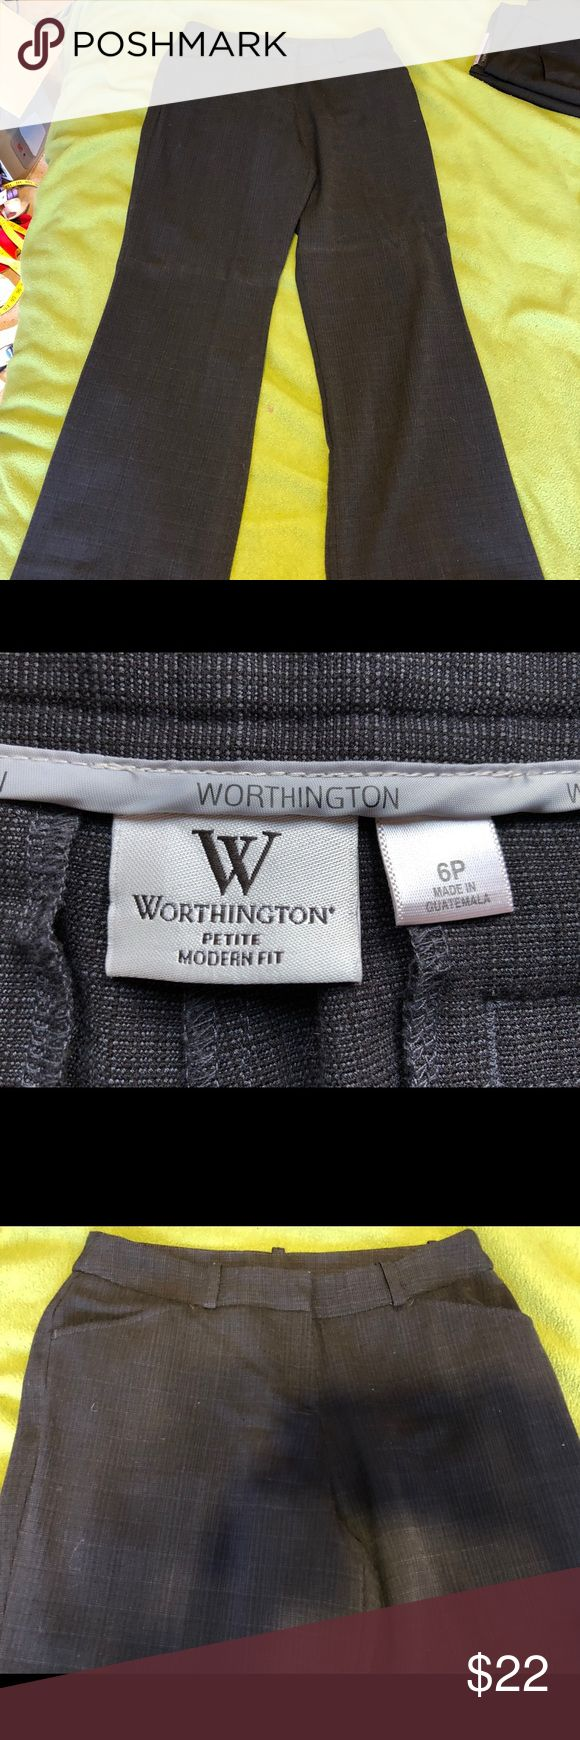 Worthington Petite navy blue dress pants-6p Worn once. Smoke free home . 6 petite, modern fit. Make an offer! Worthington Pants Trousers